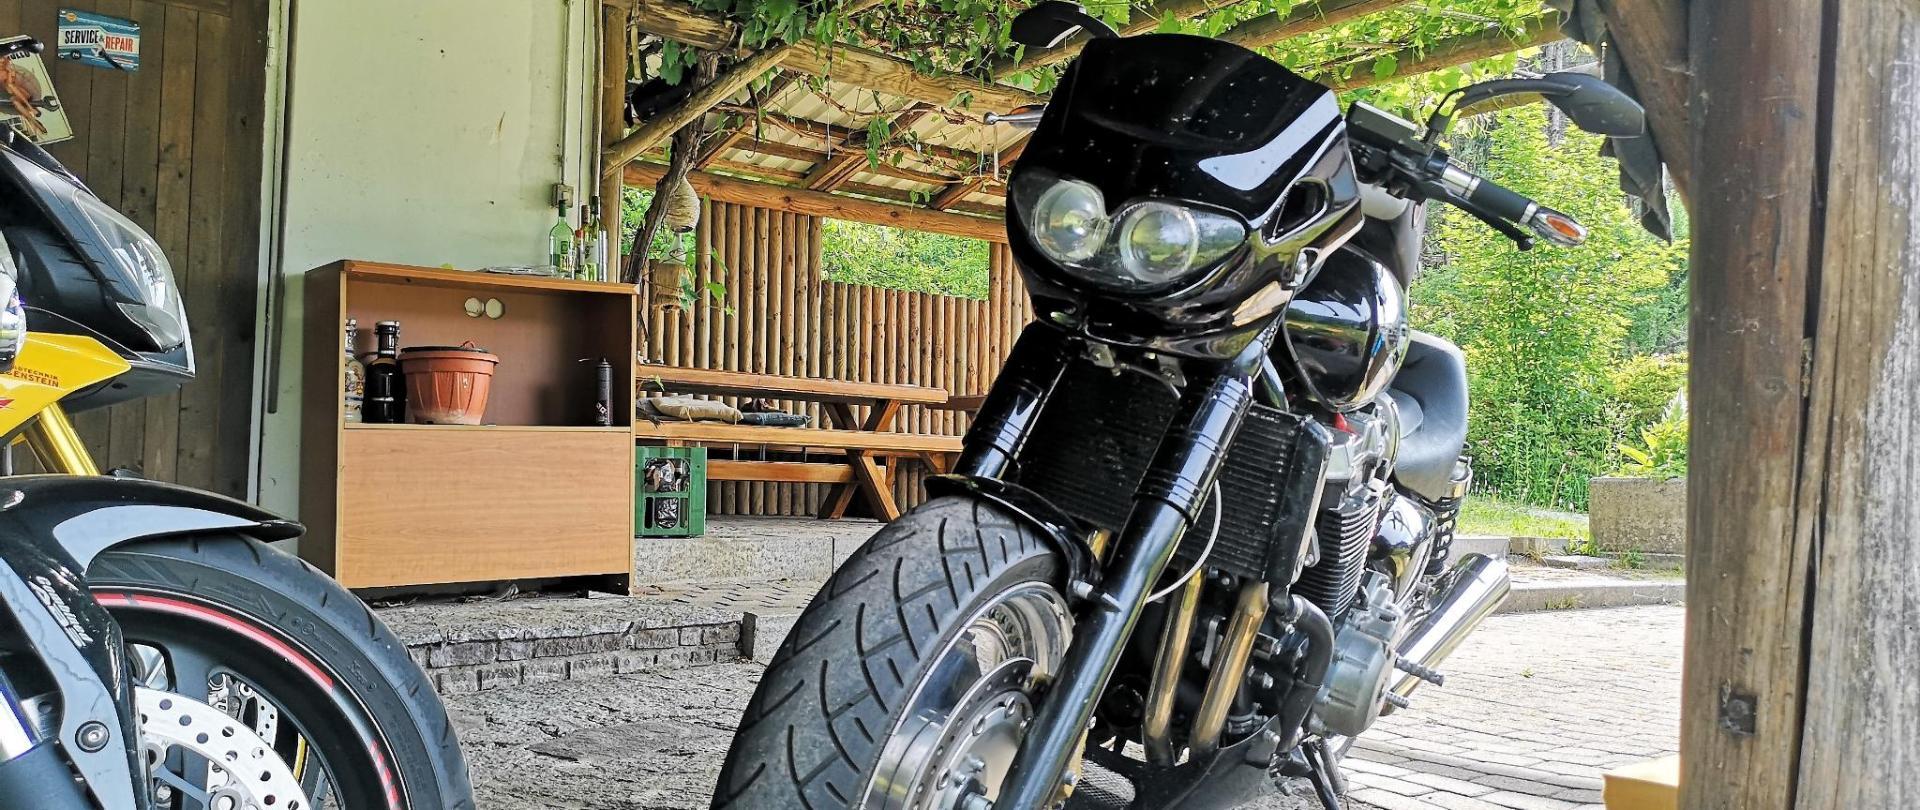 3 Motorradhotel Enzianbrenner Nassfeld, Gailtal.jpg